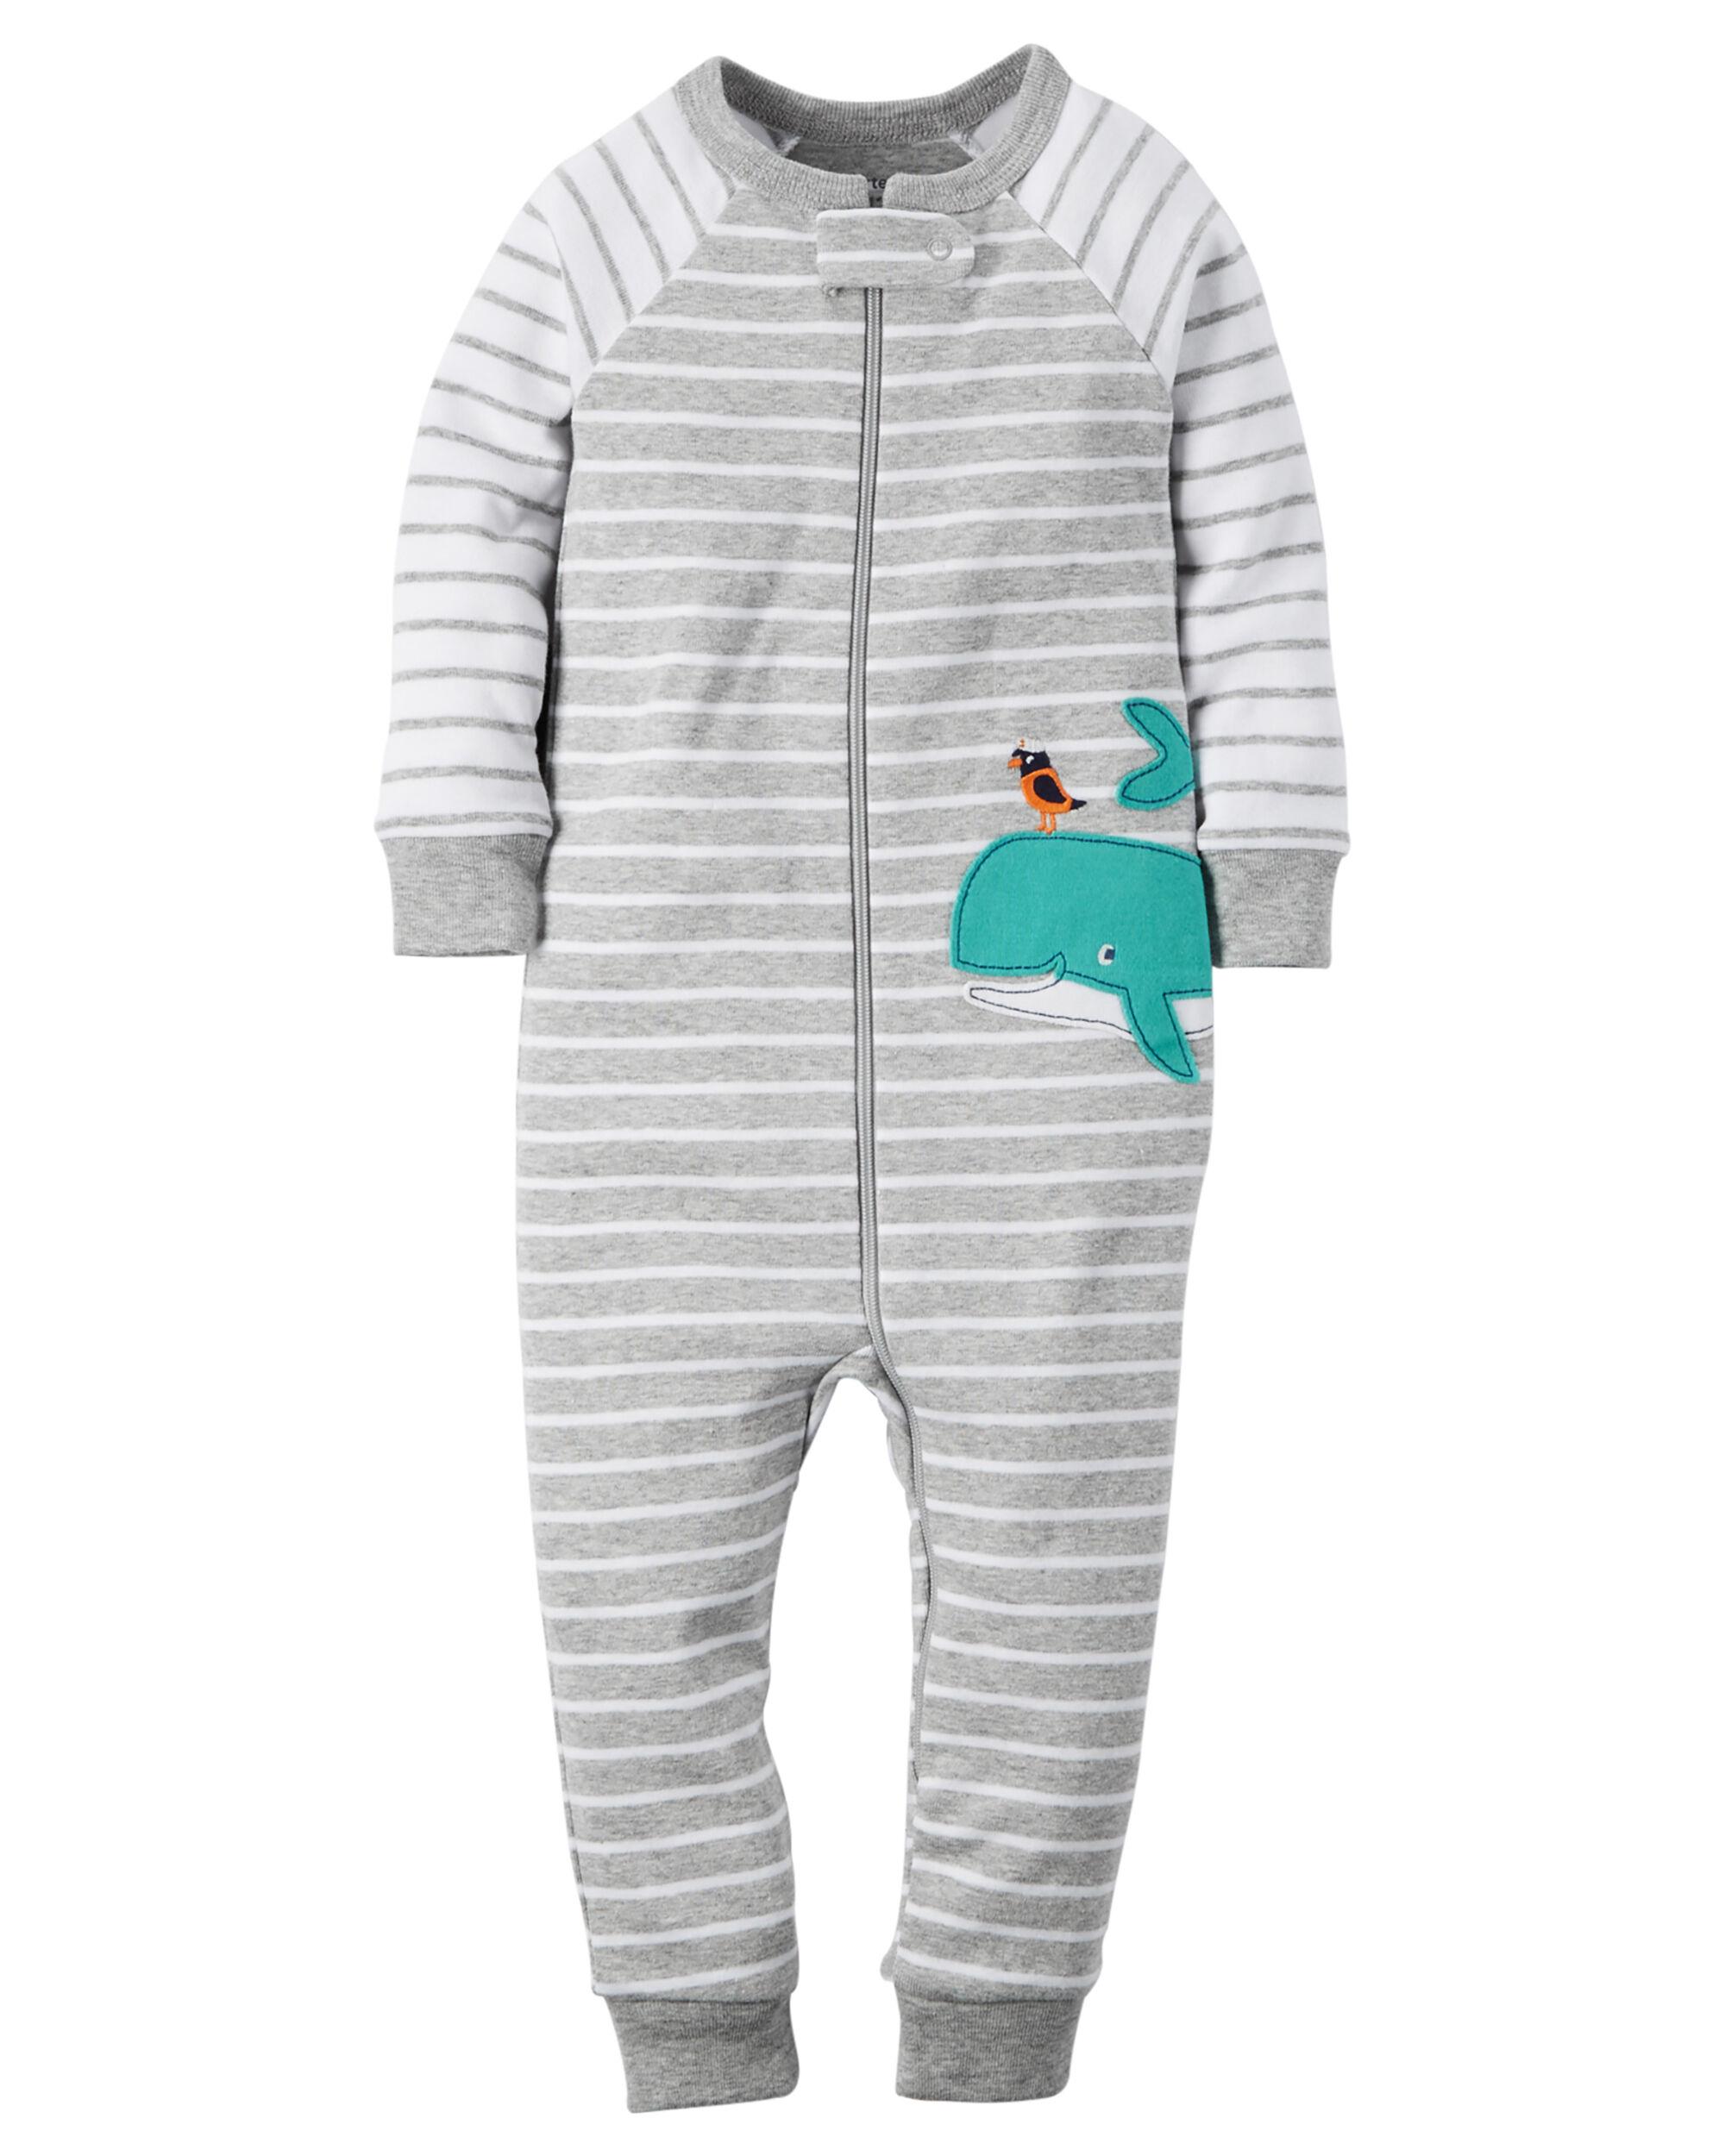 one sleepers baby infant full boy pjs sleeping summer winter size toddler sleepwear sack suit sleep feet of sleeper pajamas legs outfit fleece piece babies footed for warm flannel bag with